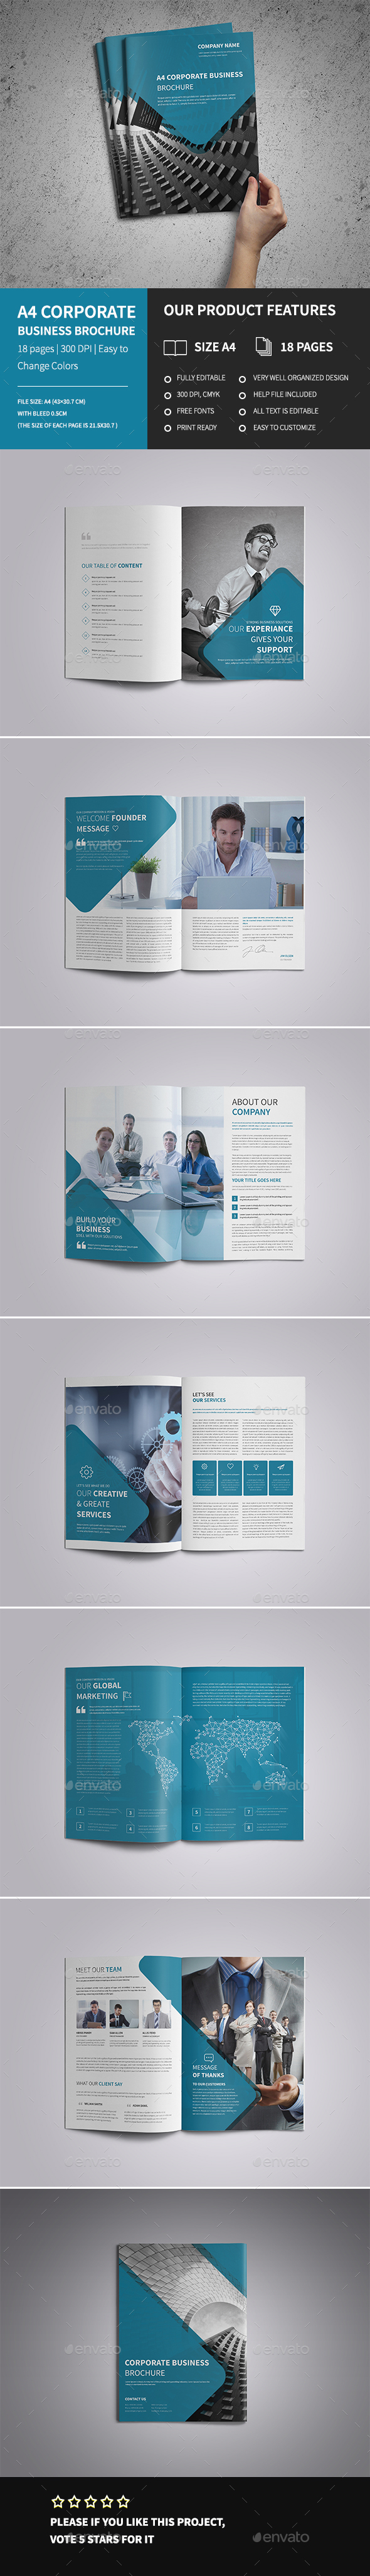 A4 Corporate Business Brochure  - Corporate Brochures